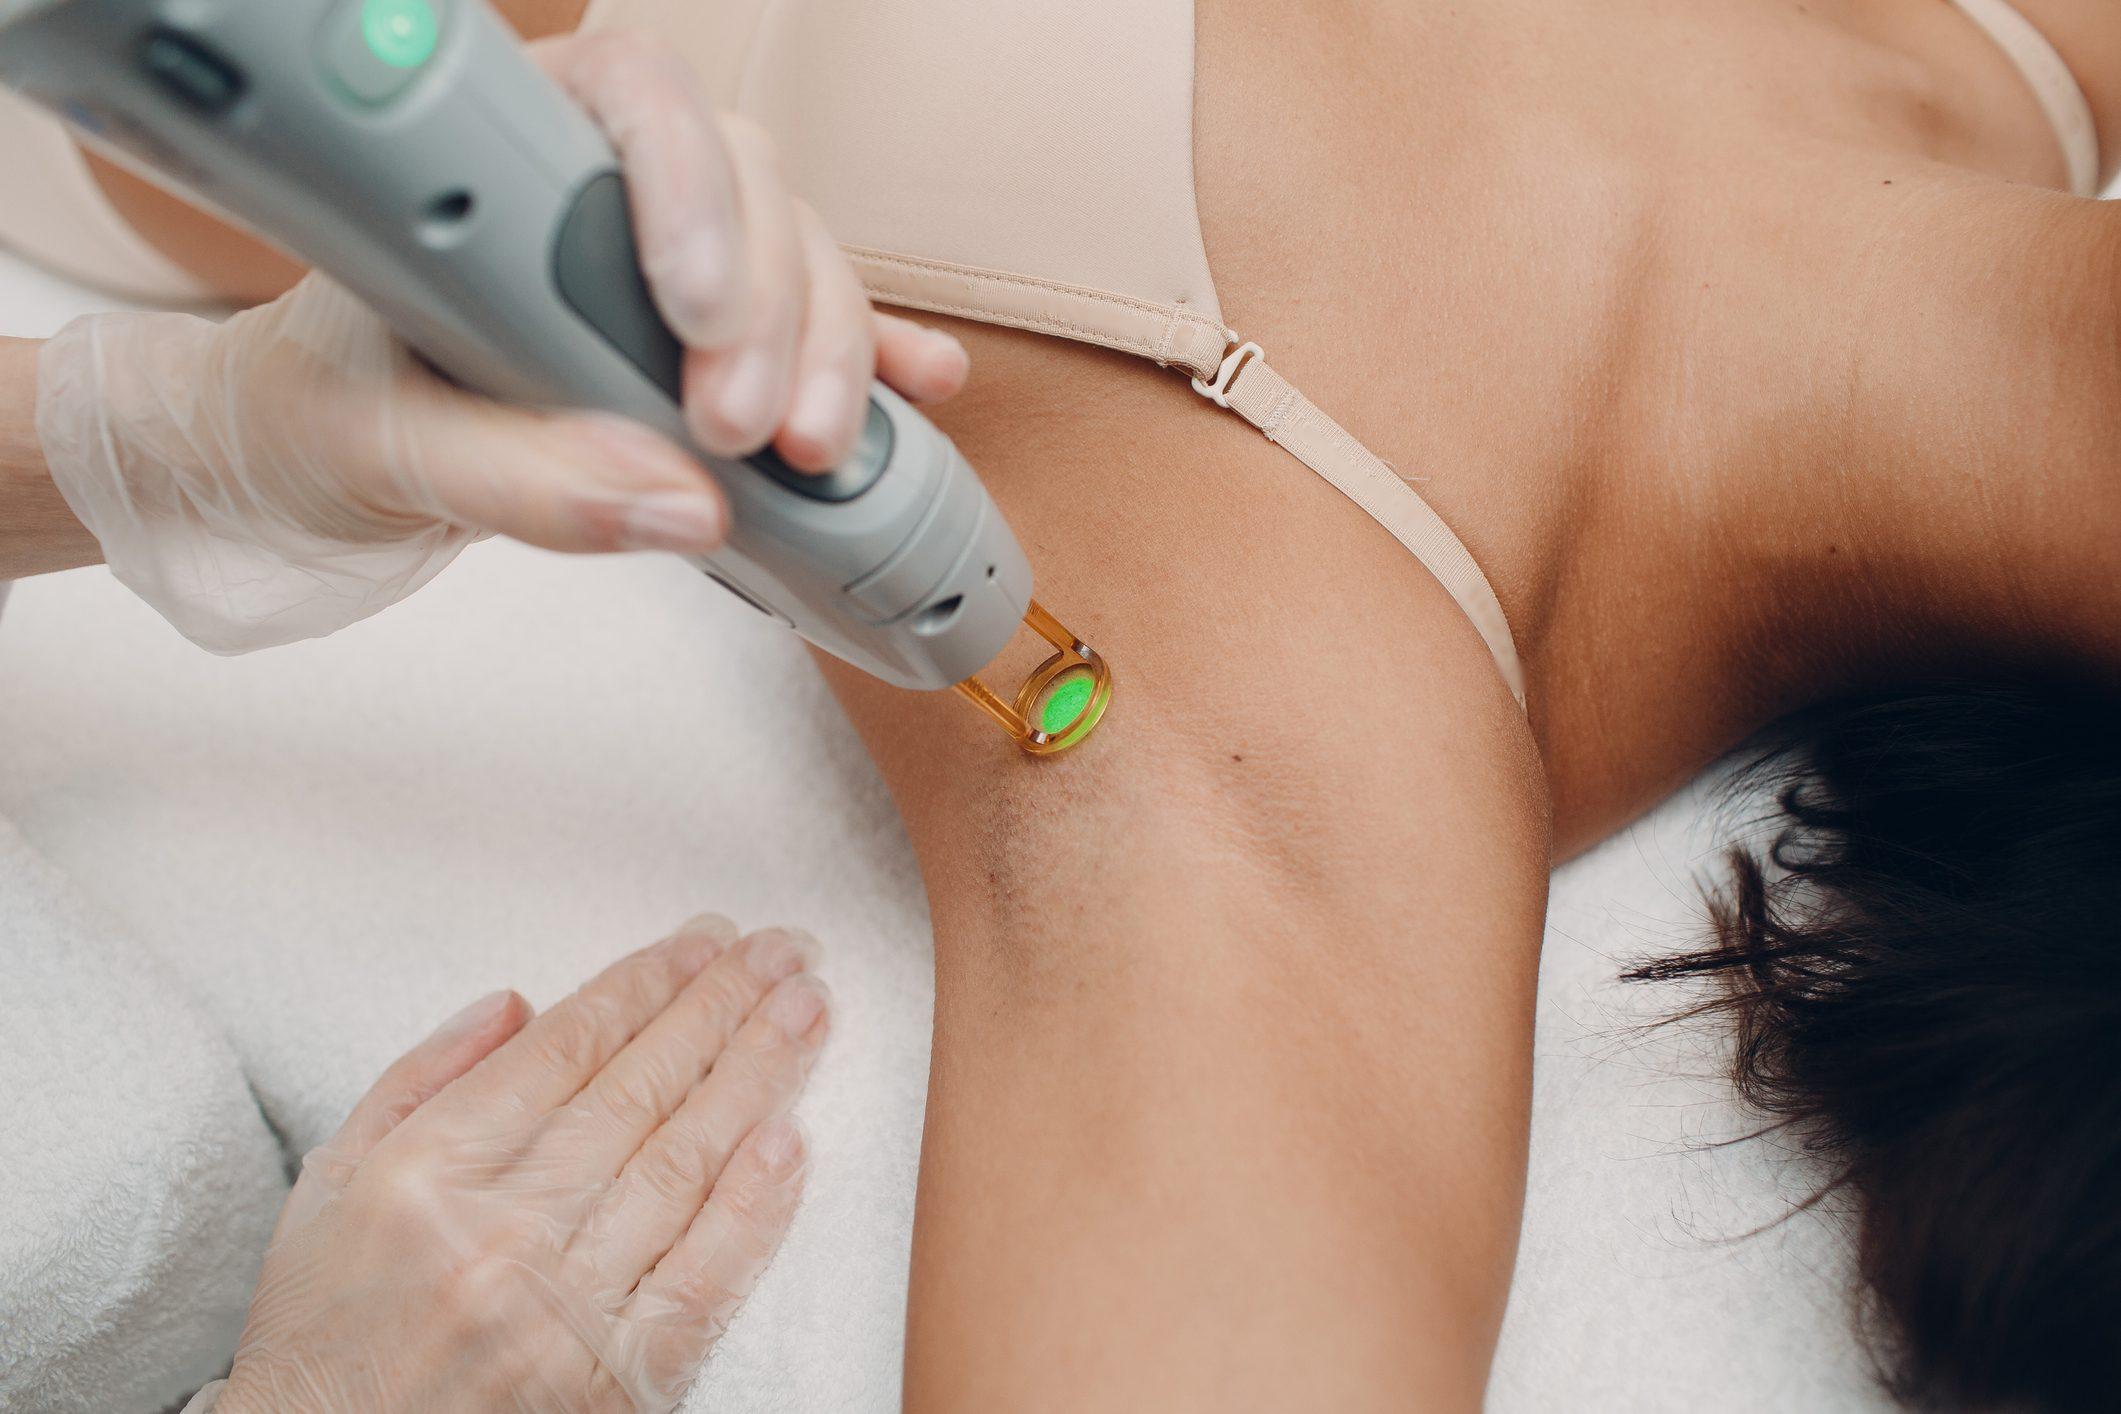 armpit laser hair removal close up